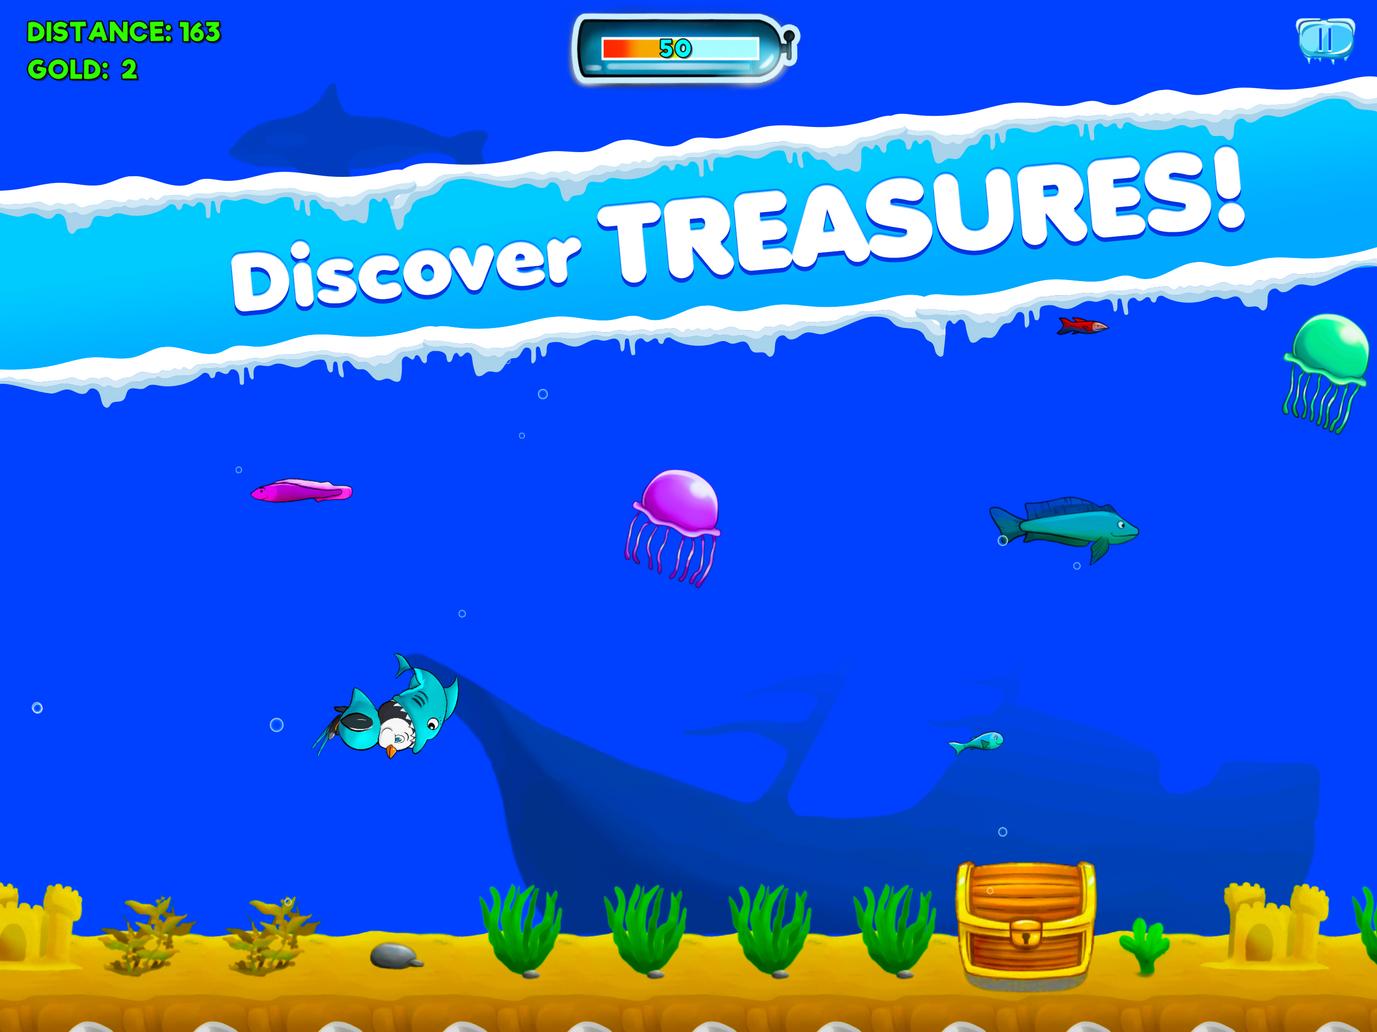 Dicover Treasures